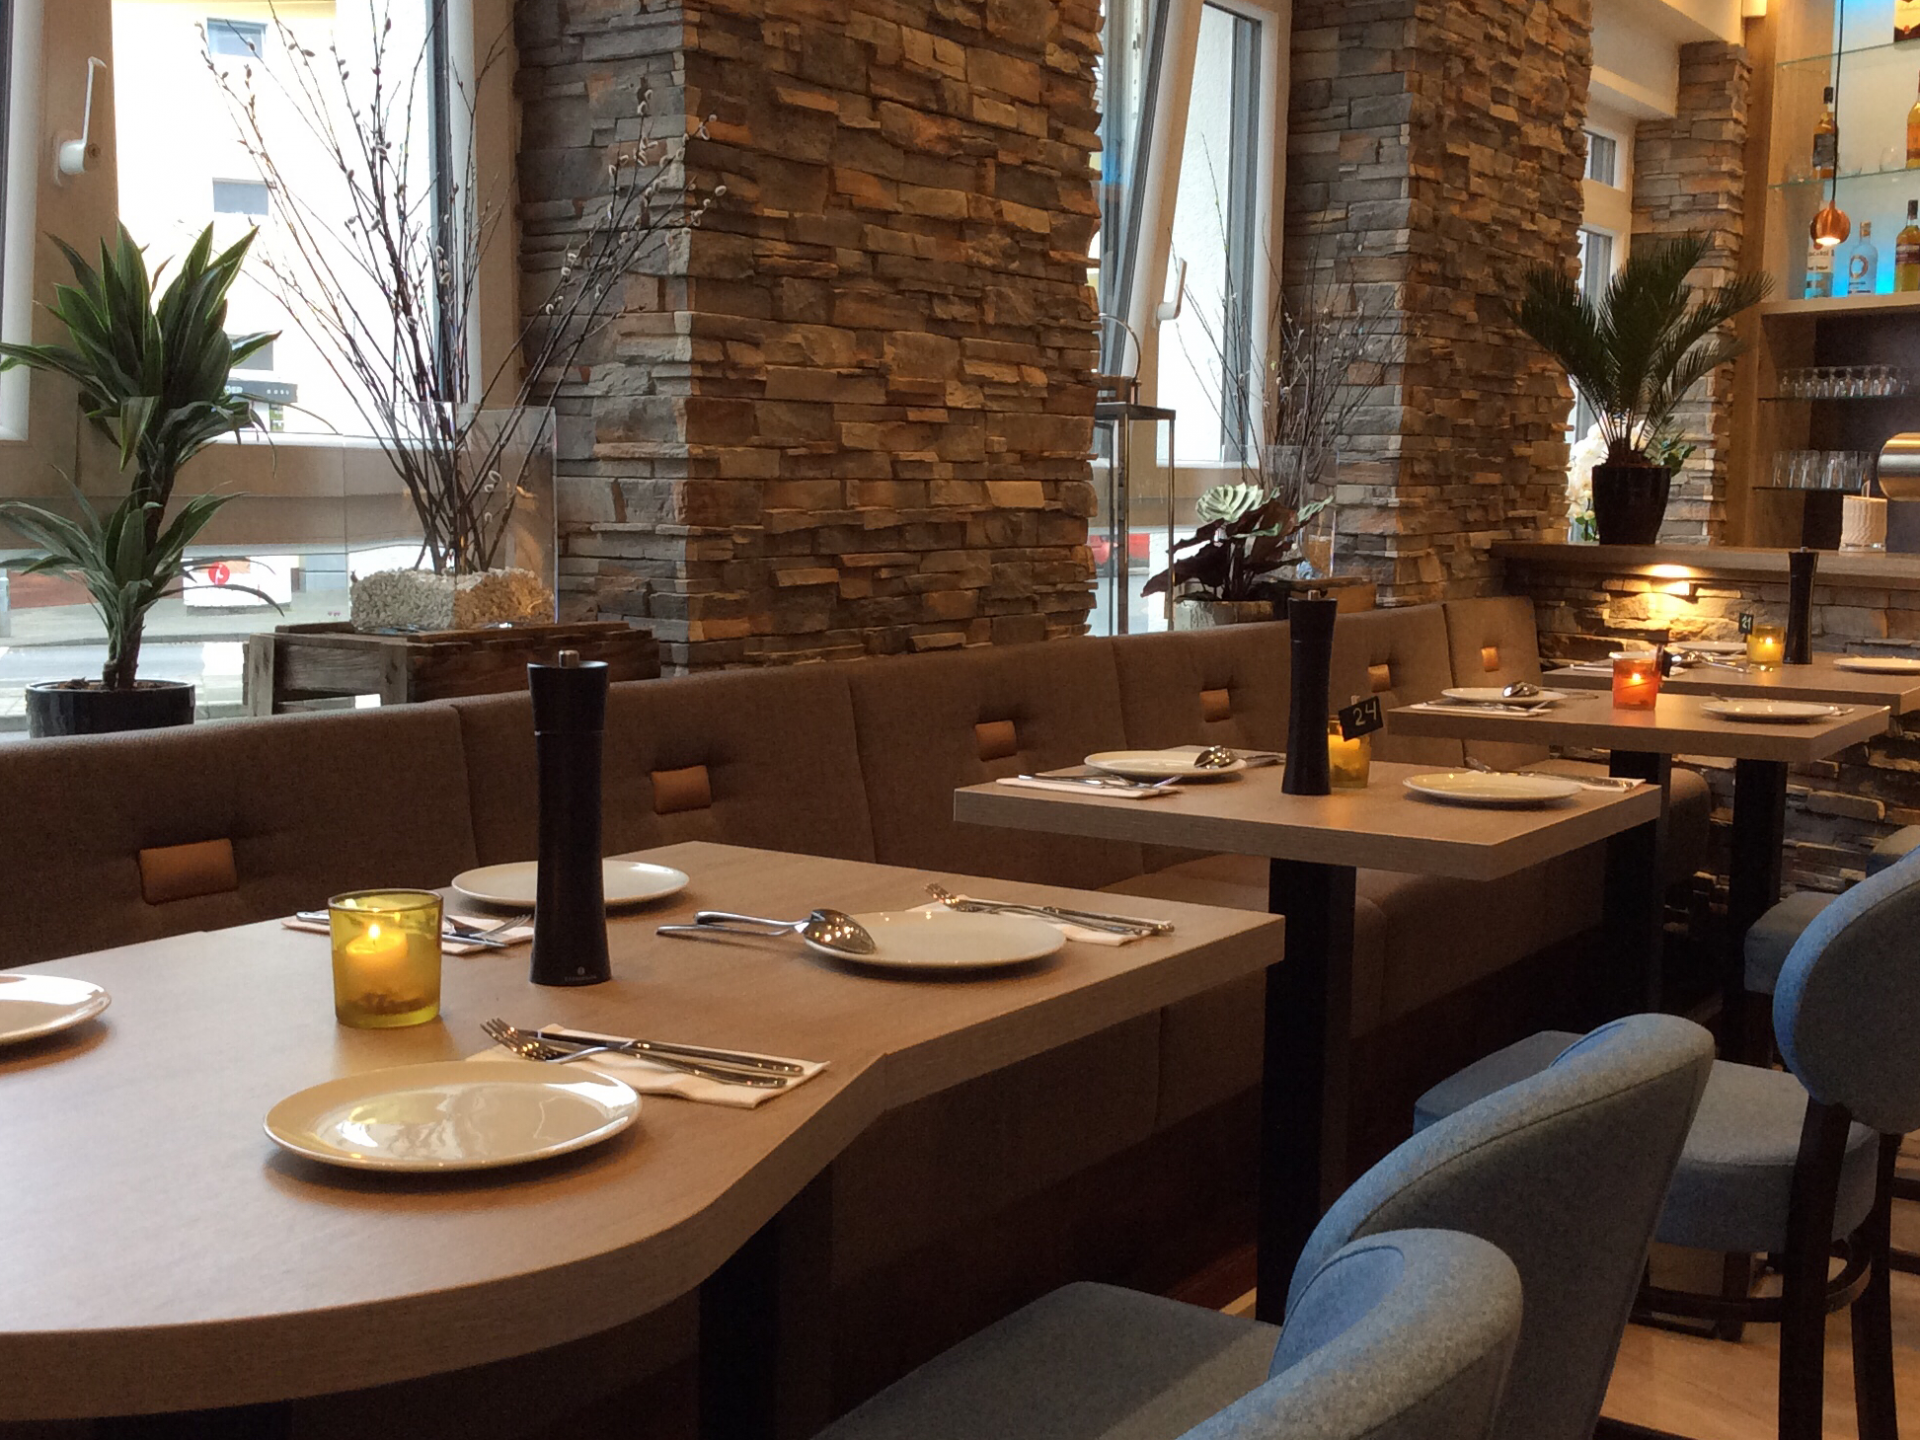 Gastronomie Möbel Restaurant Interieur